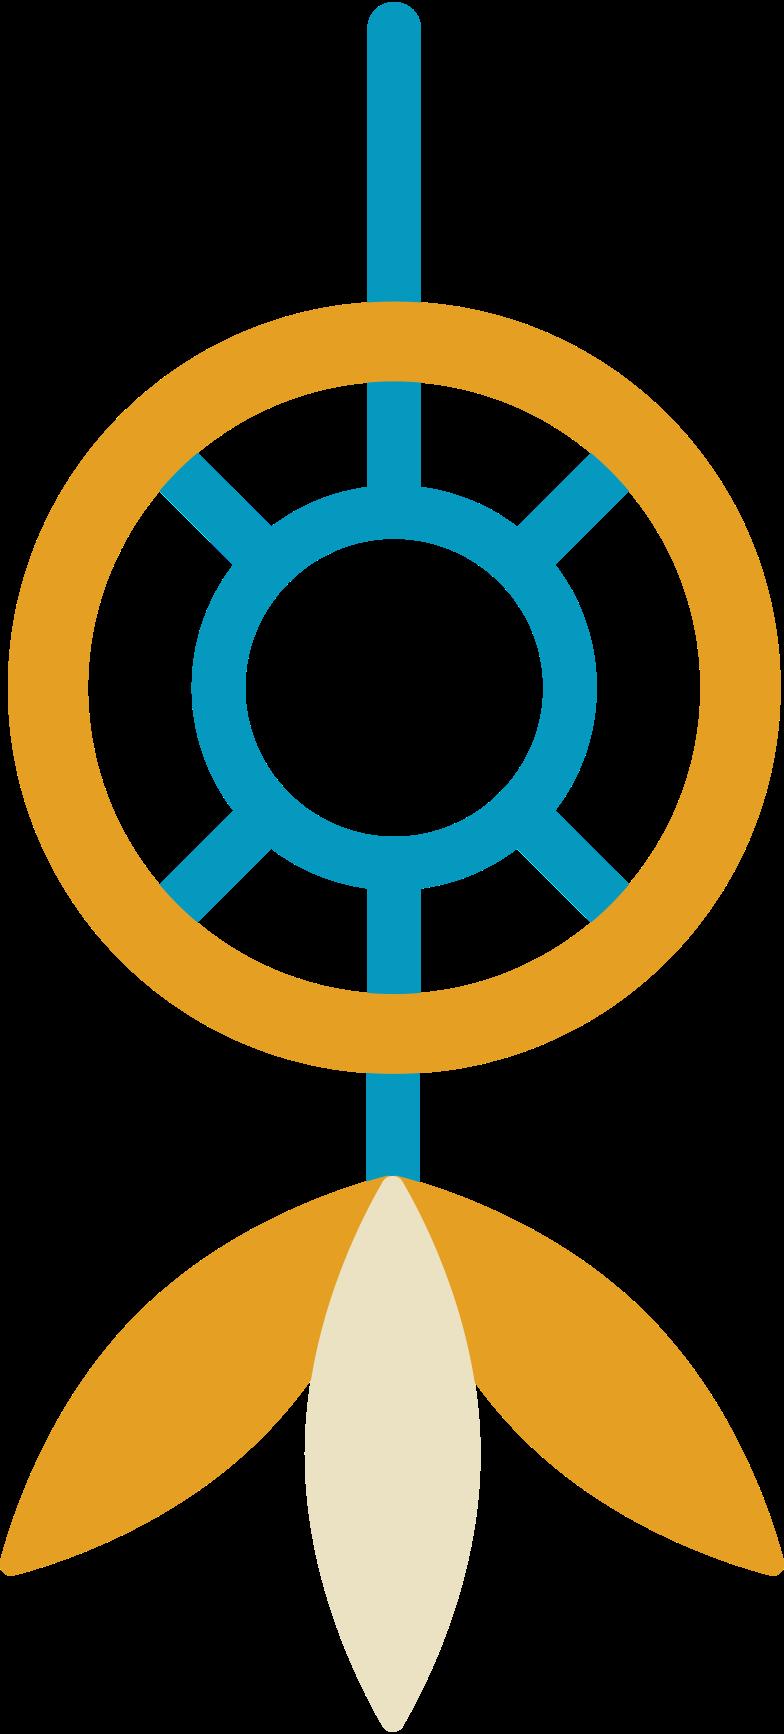 dreamcatcher Clipart illustration in PNG, SVG